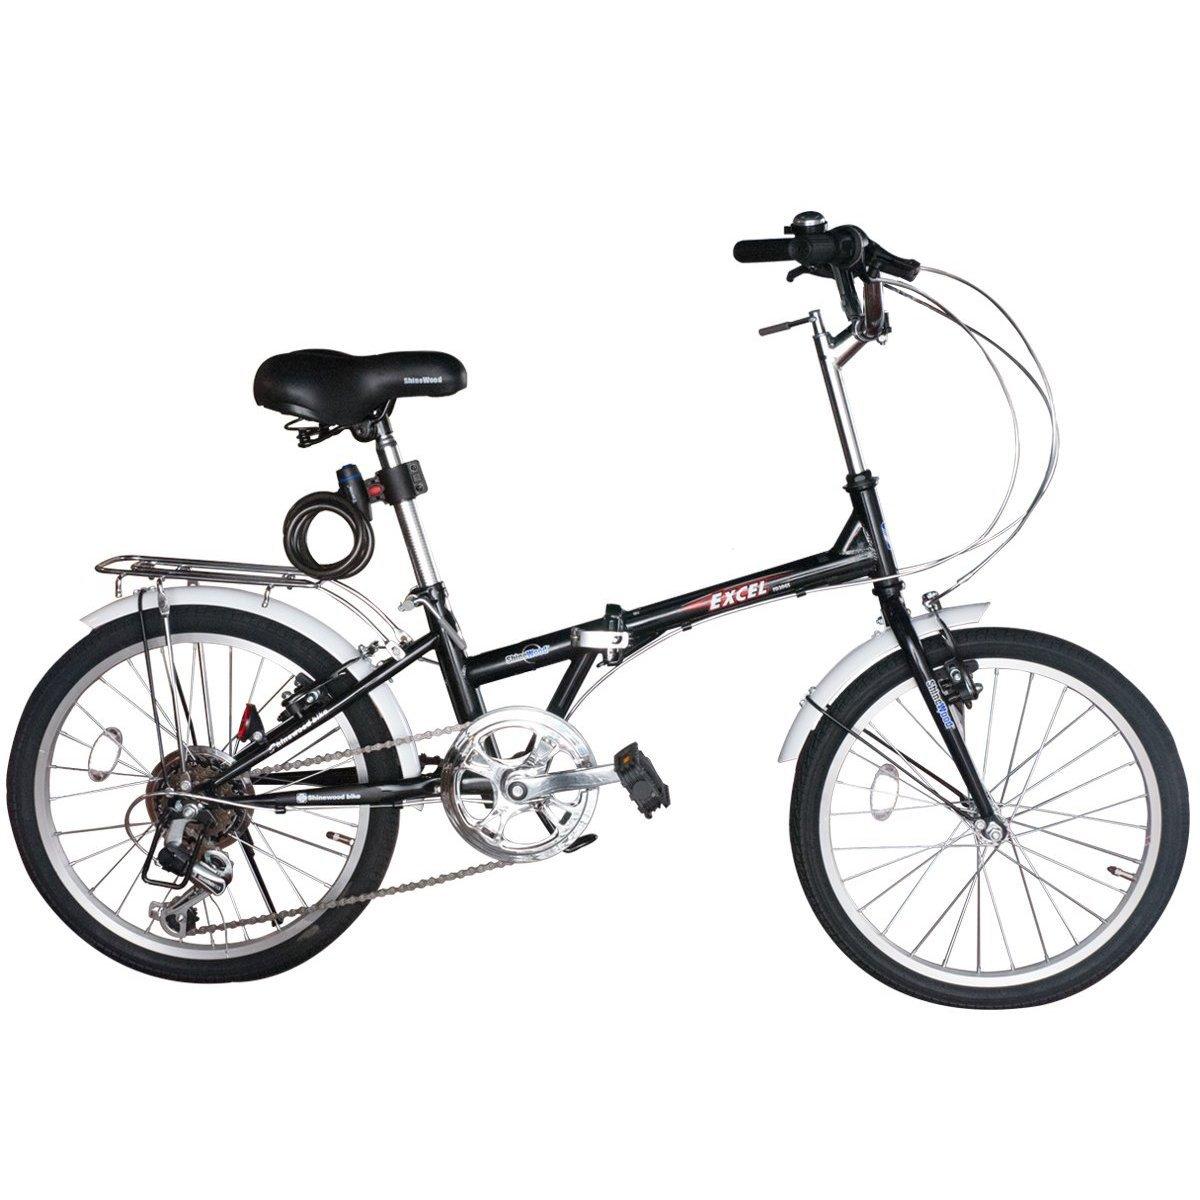 SHINE WOOD(シャインウッド) 折りたたみ自転車 20インチ 自転車 シマノ6段変速 軽量 B009T1WN1A ブラック ブラック